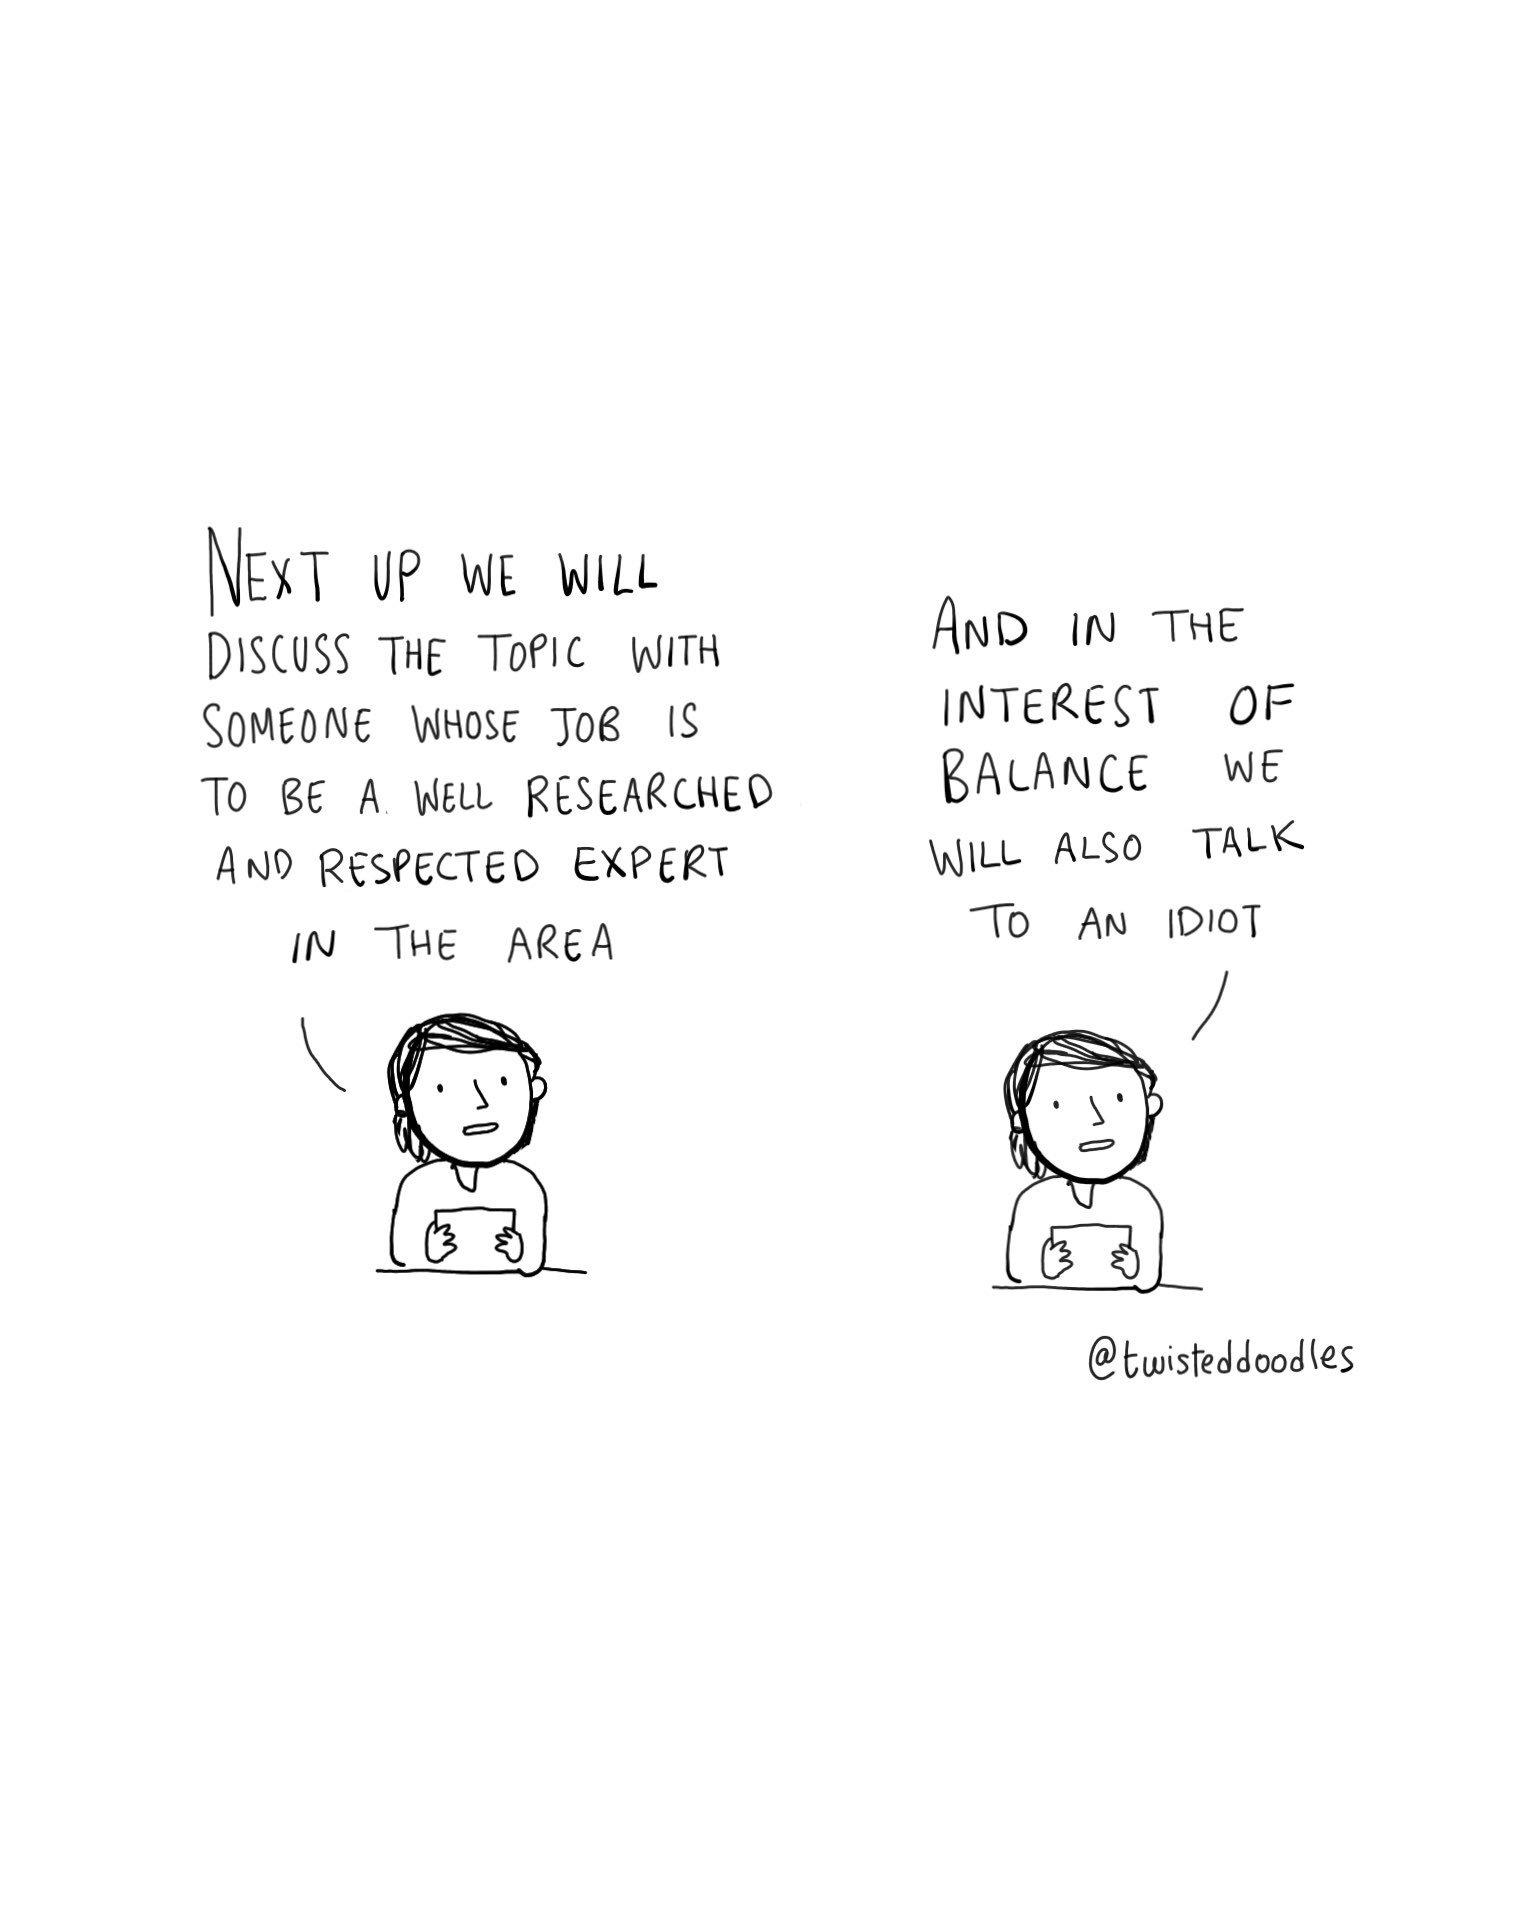 In the interest of balance... https://t.co/pDLAzTPz5q